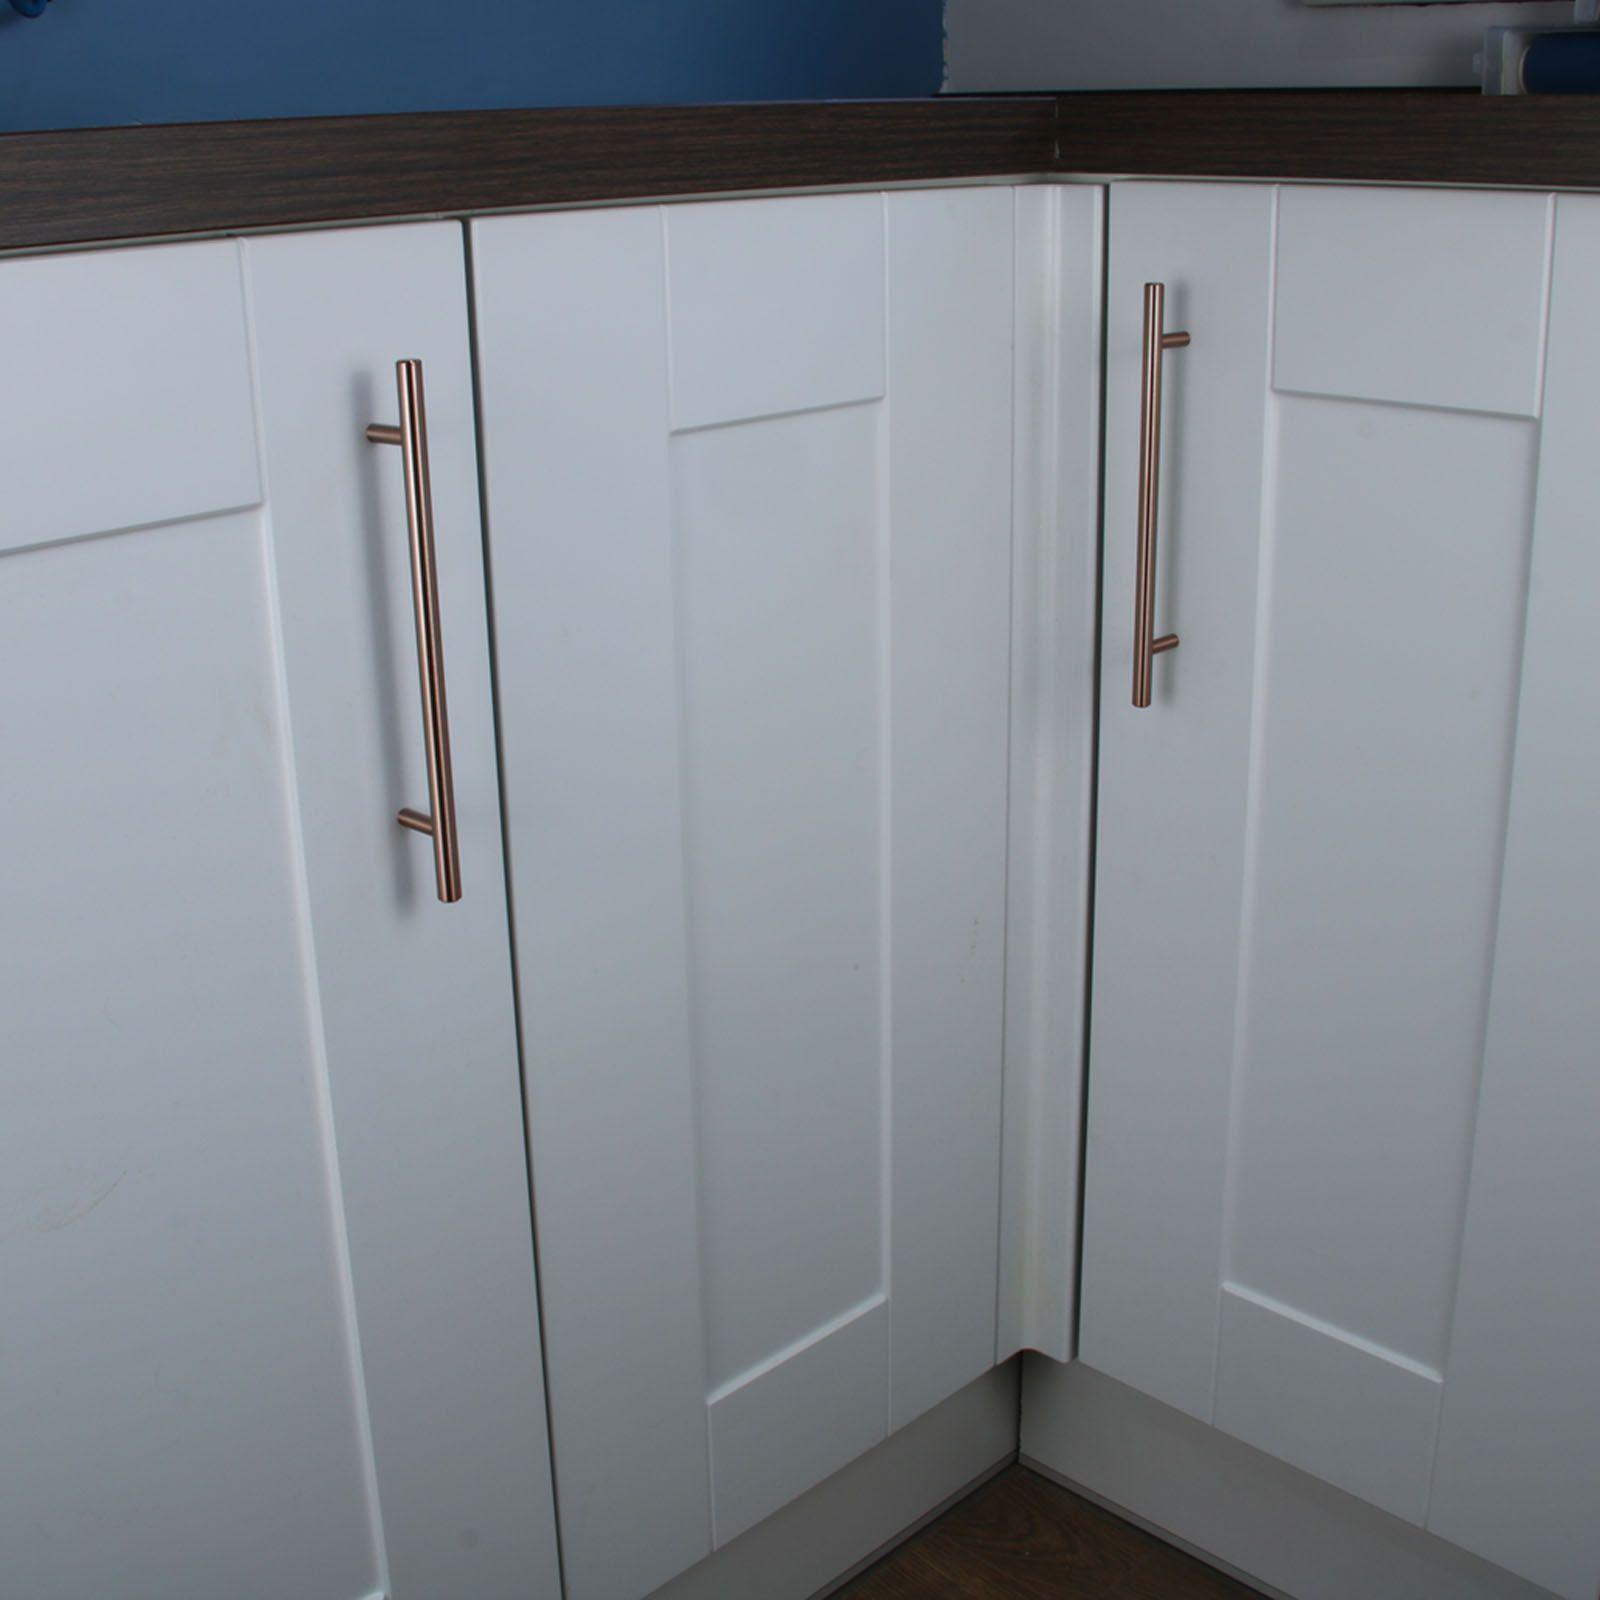 Copper Cupboard Handles 160mm In T Bar Style P110509cu Kitchen